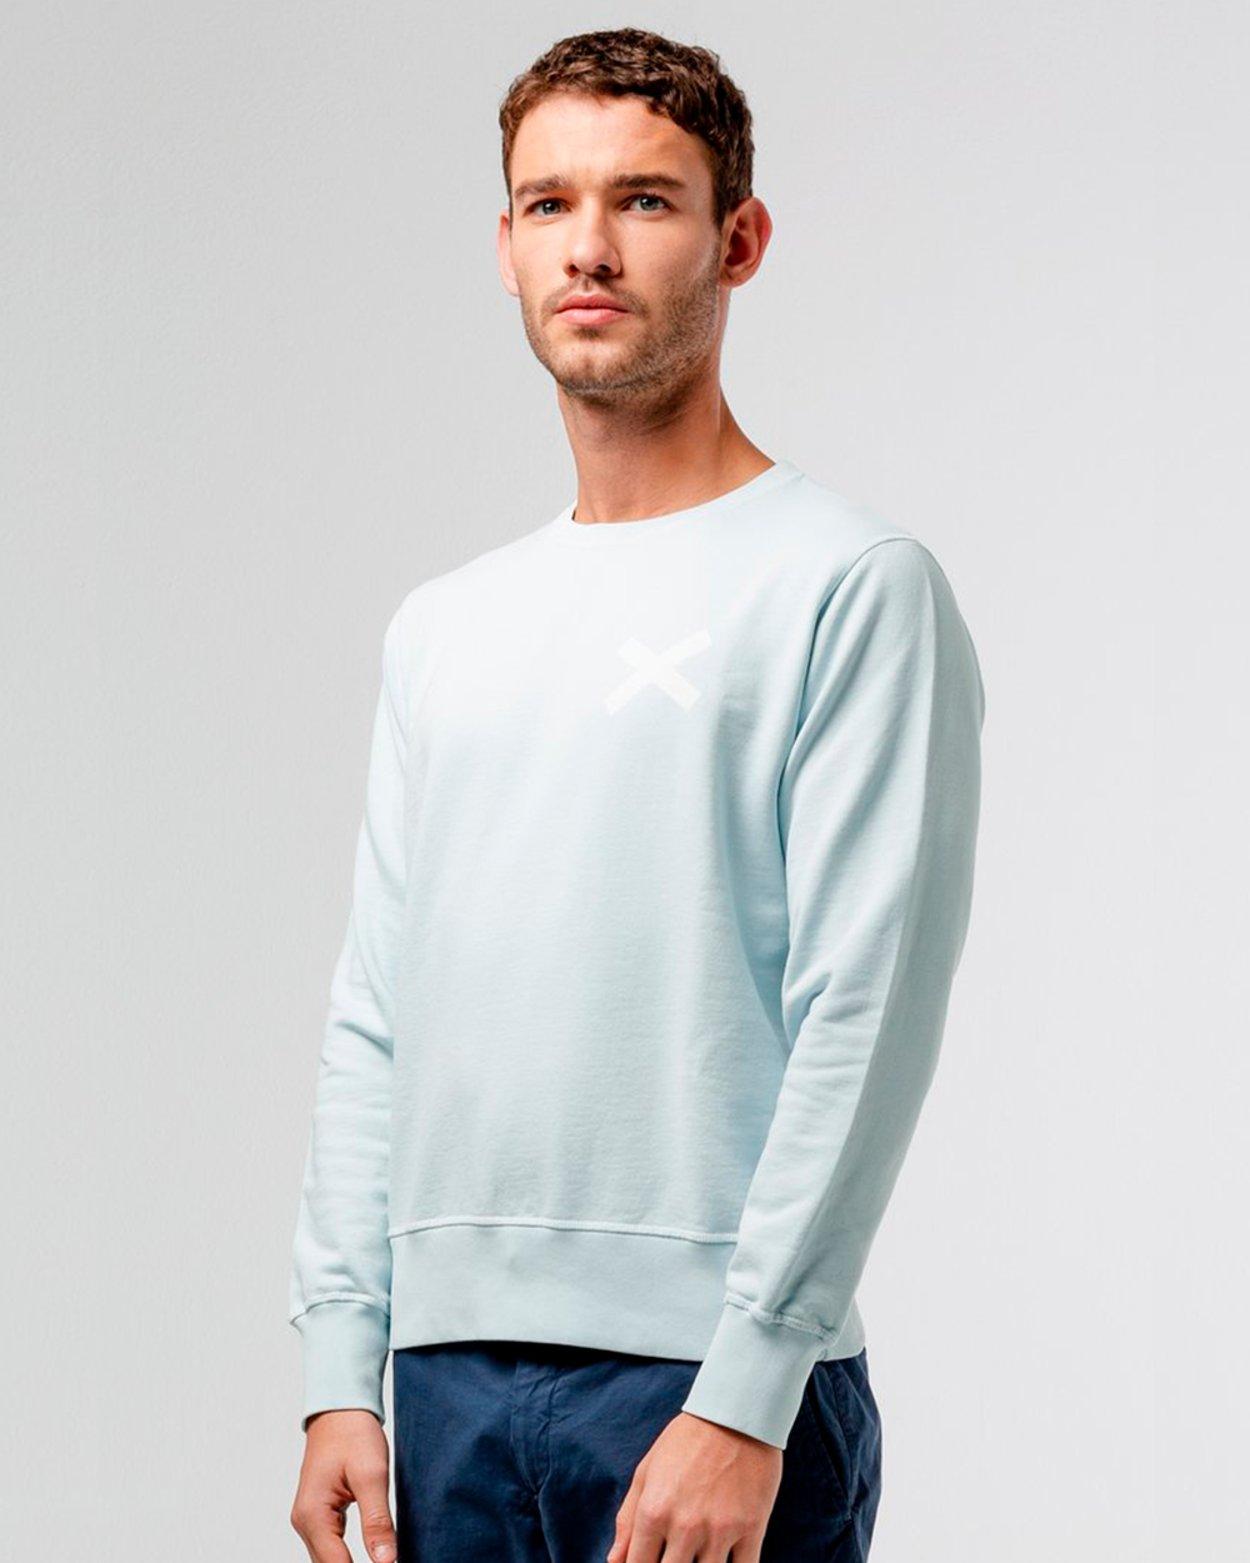 Cross Sweatshirt